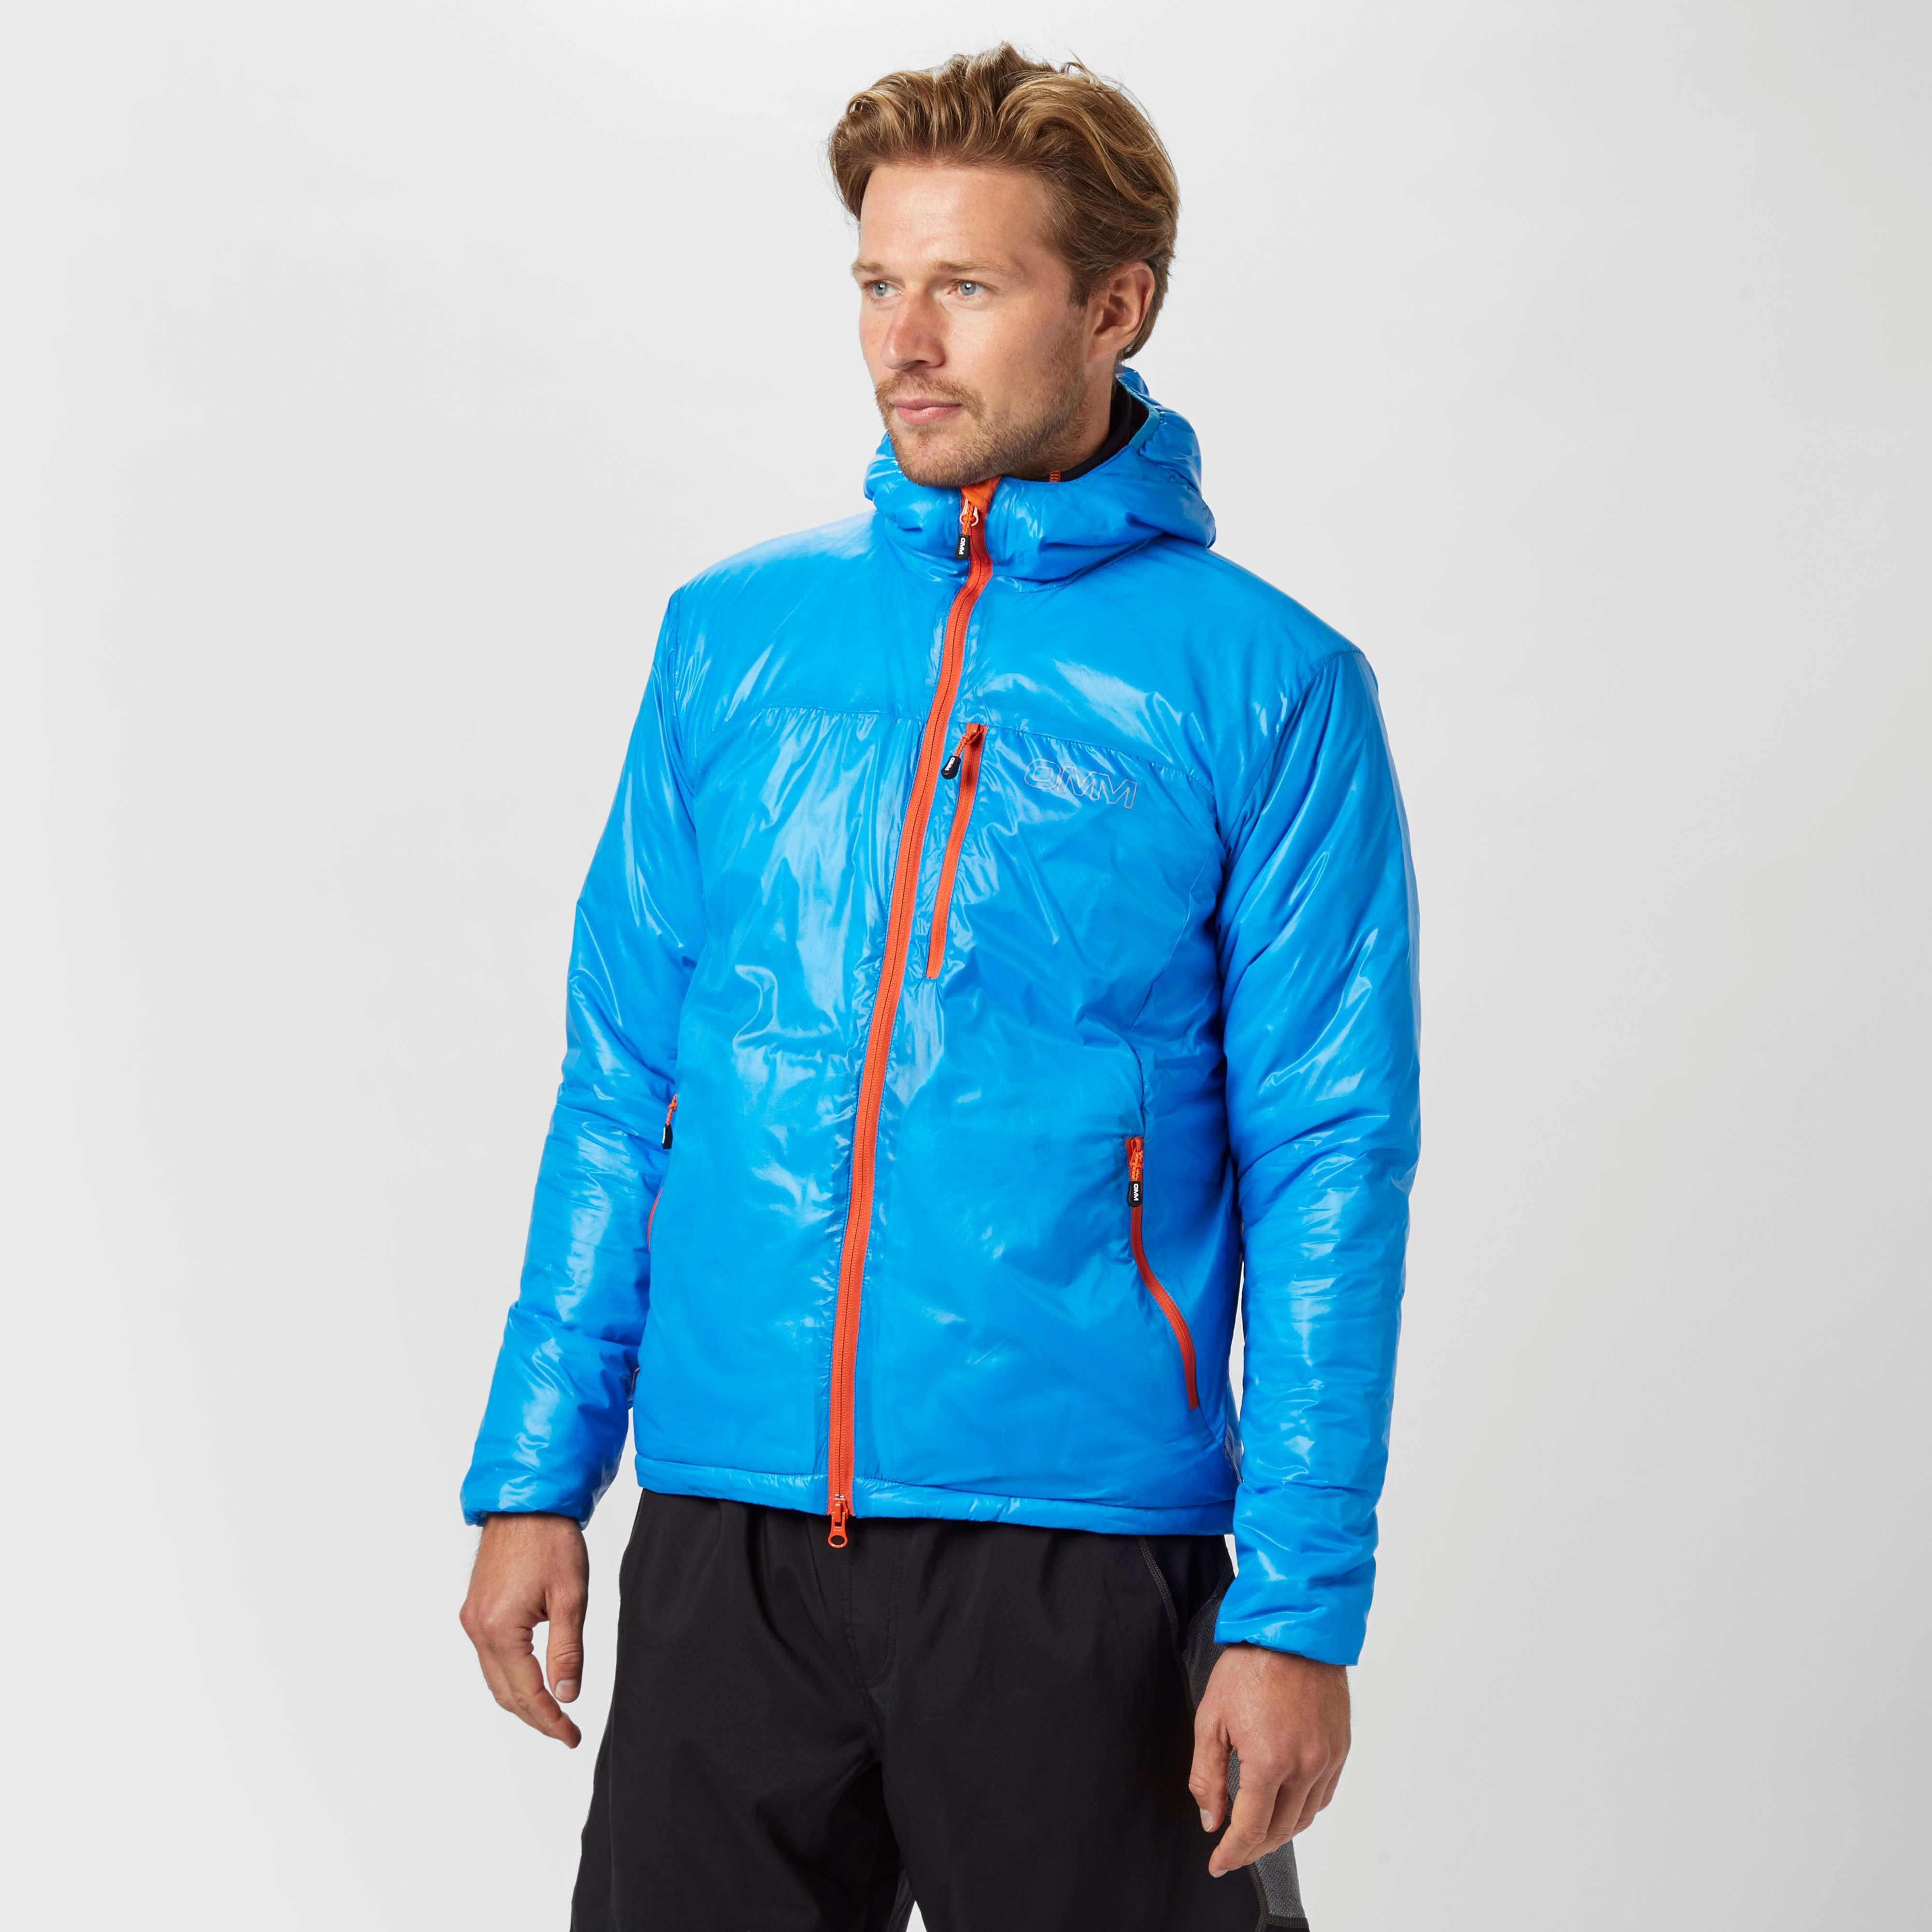 OMM Men's Mountain Raid Jacket